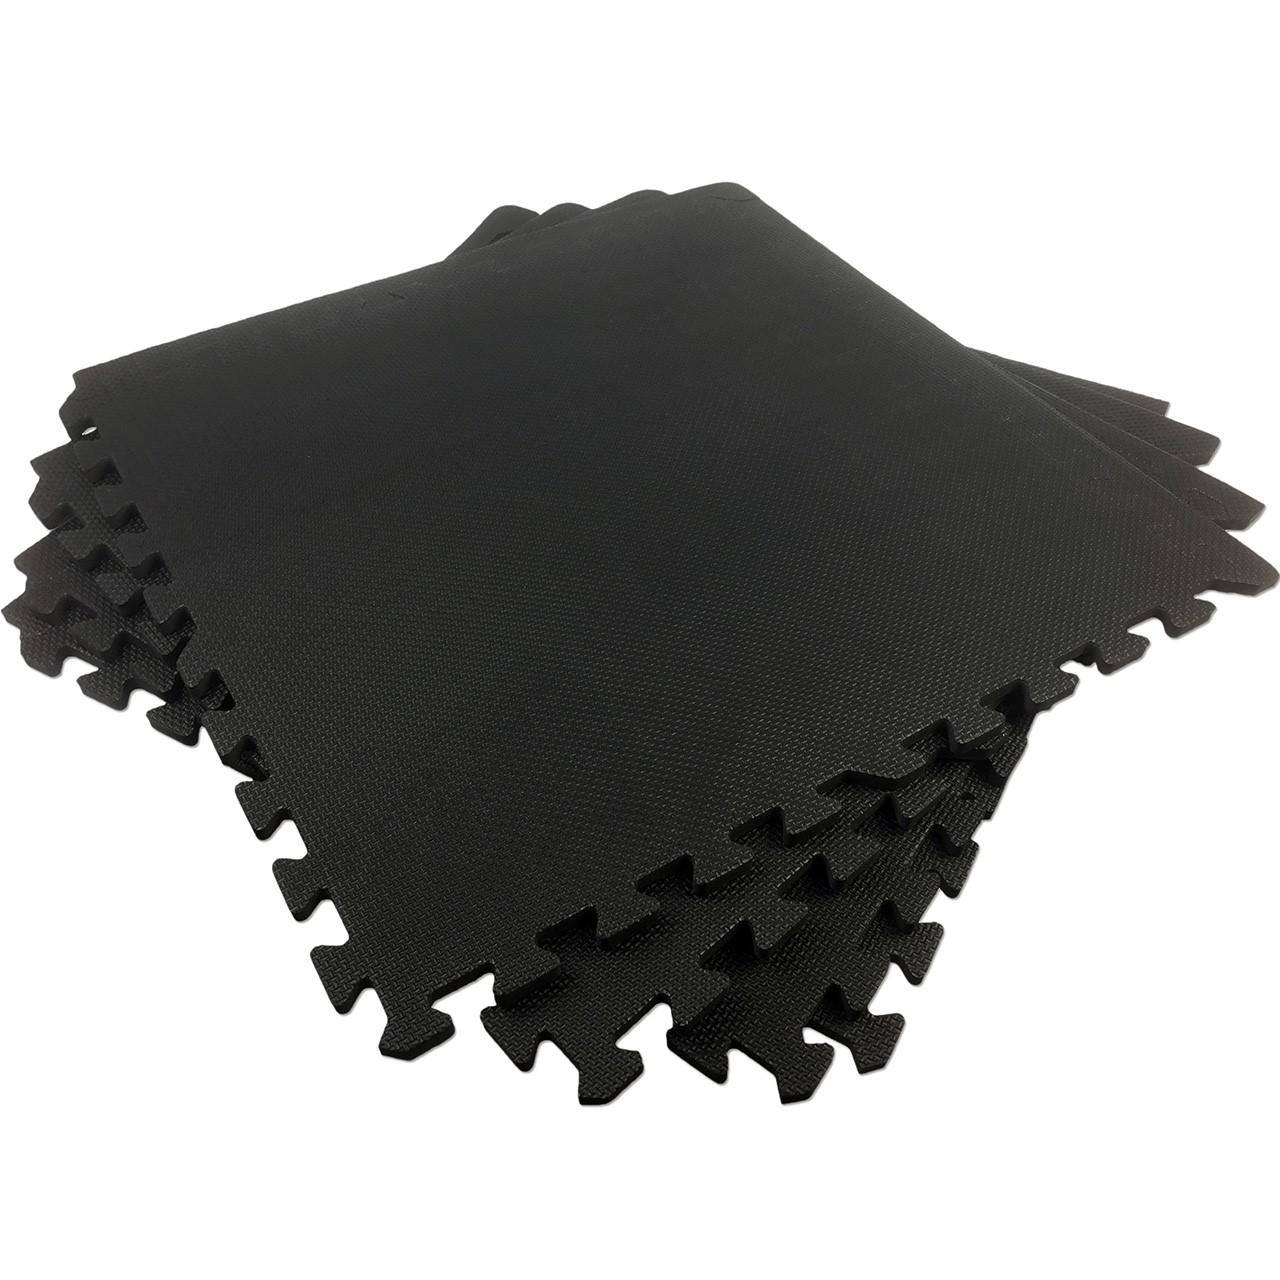 Podložka Puzzle 180x120 cm TUNTURI